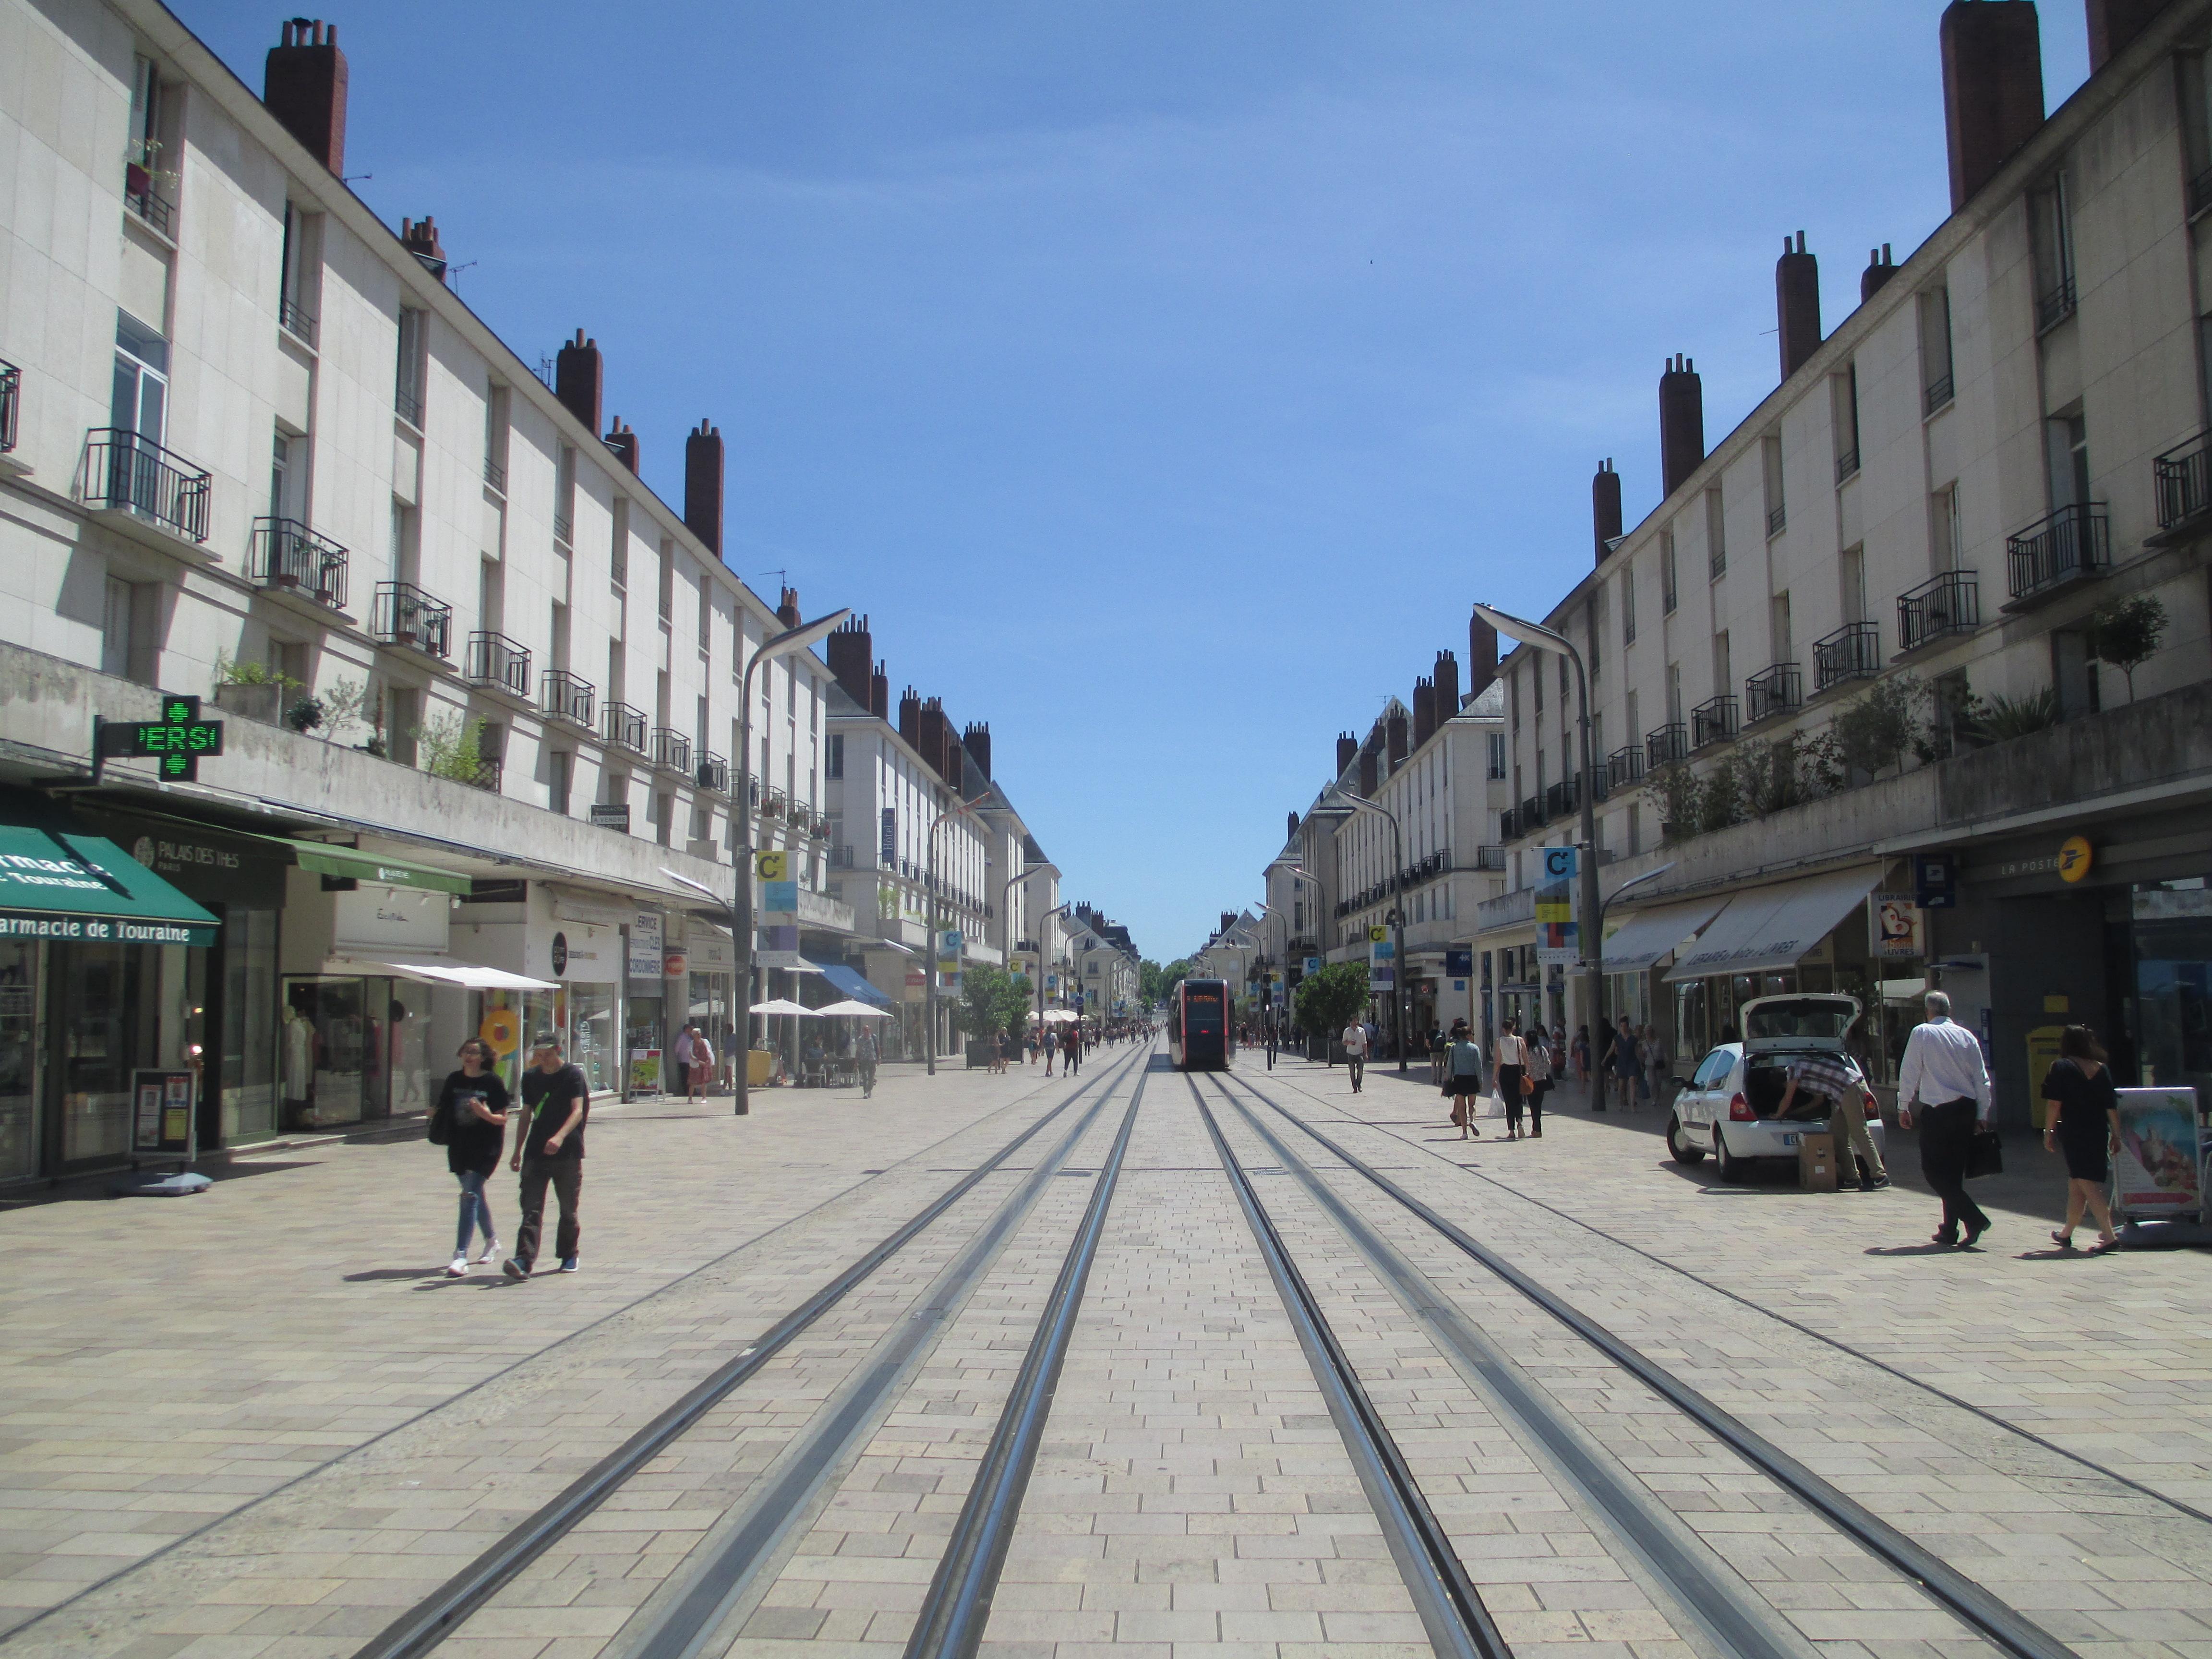 Rue Nationale Tours Wikipédia